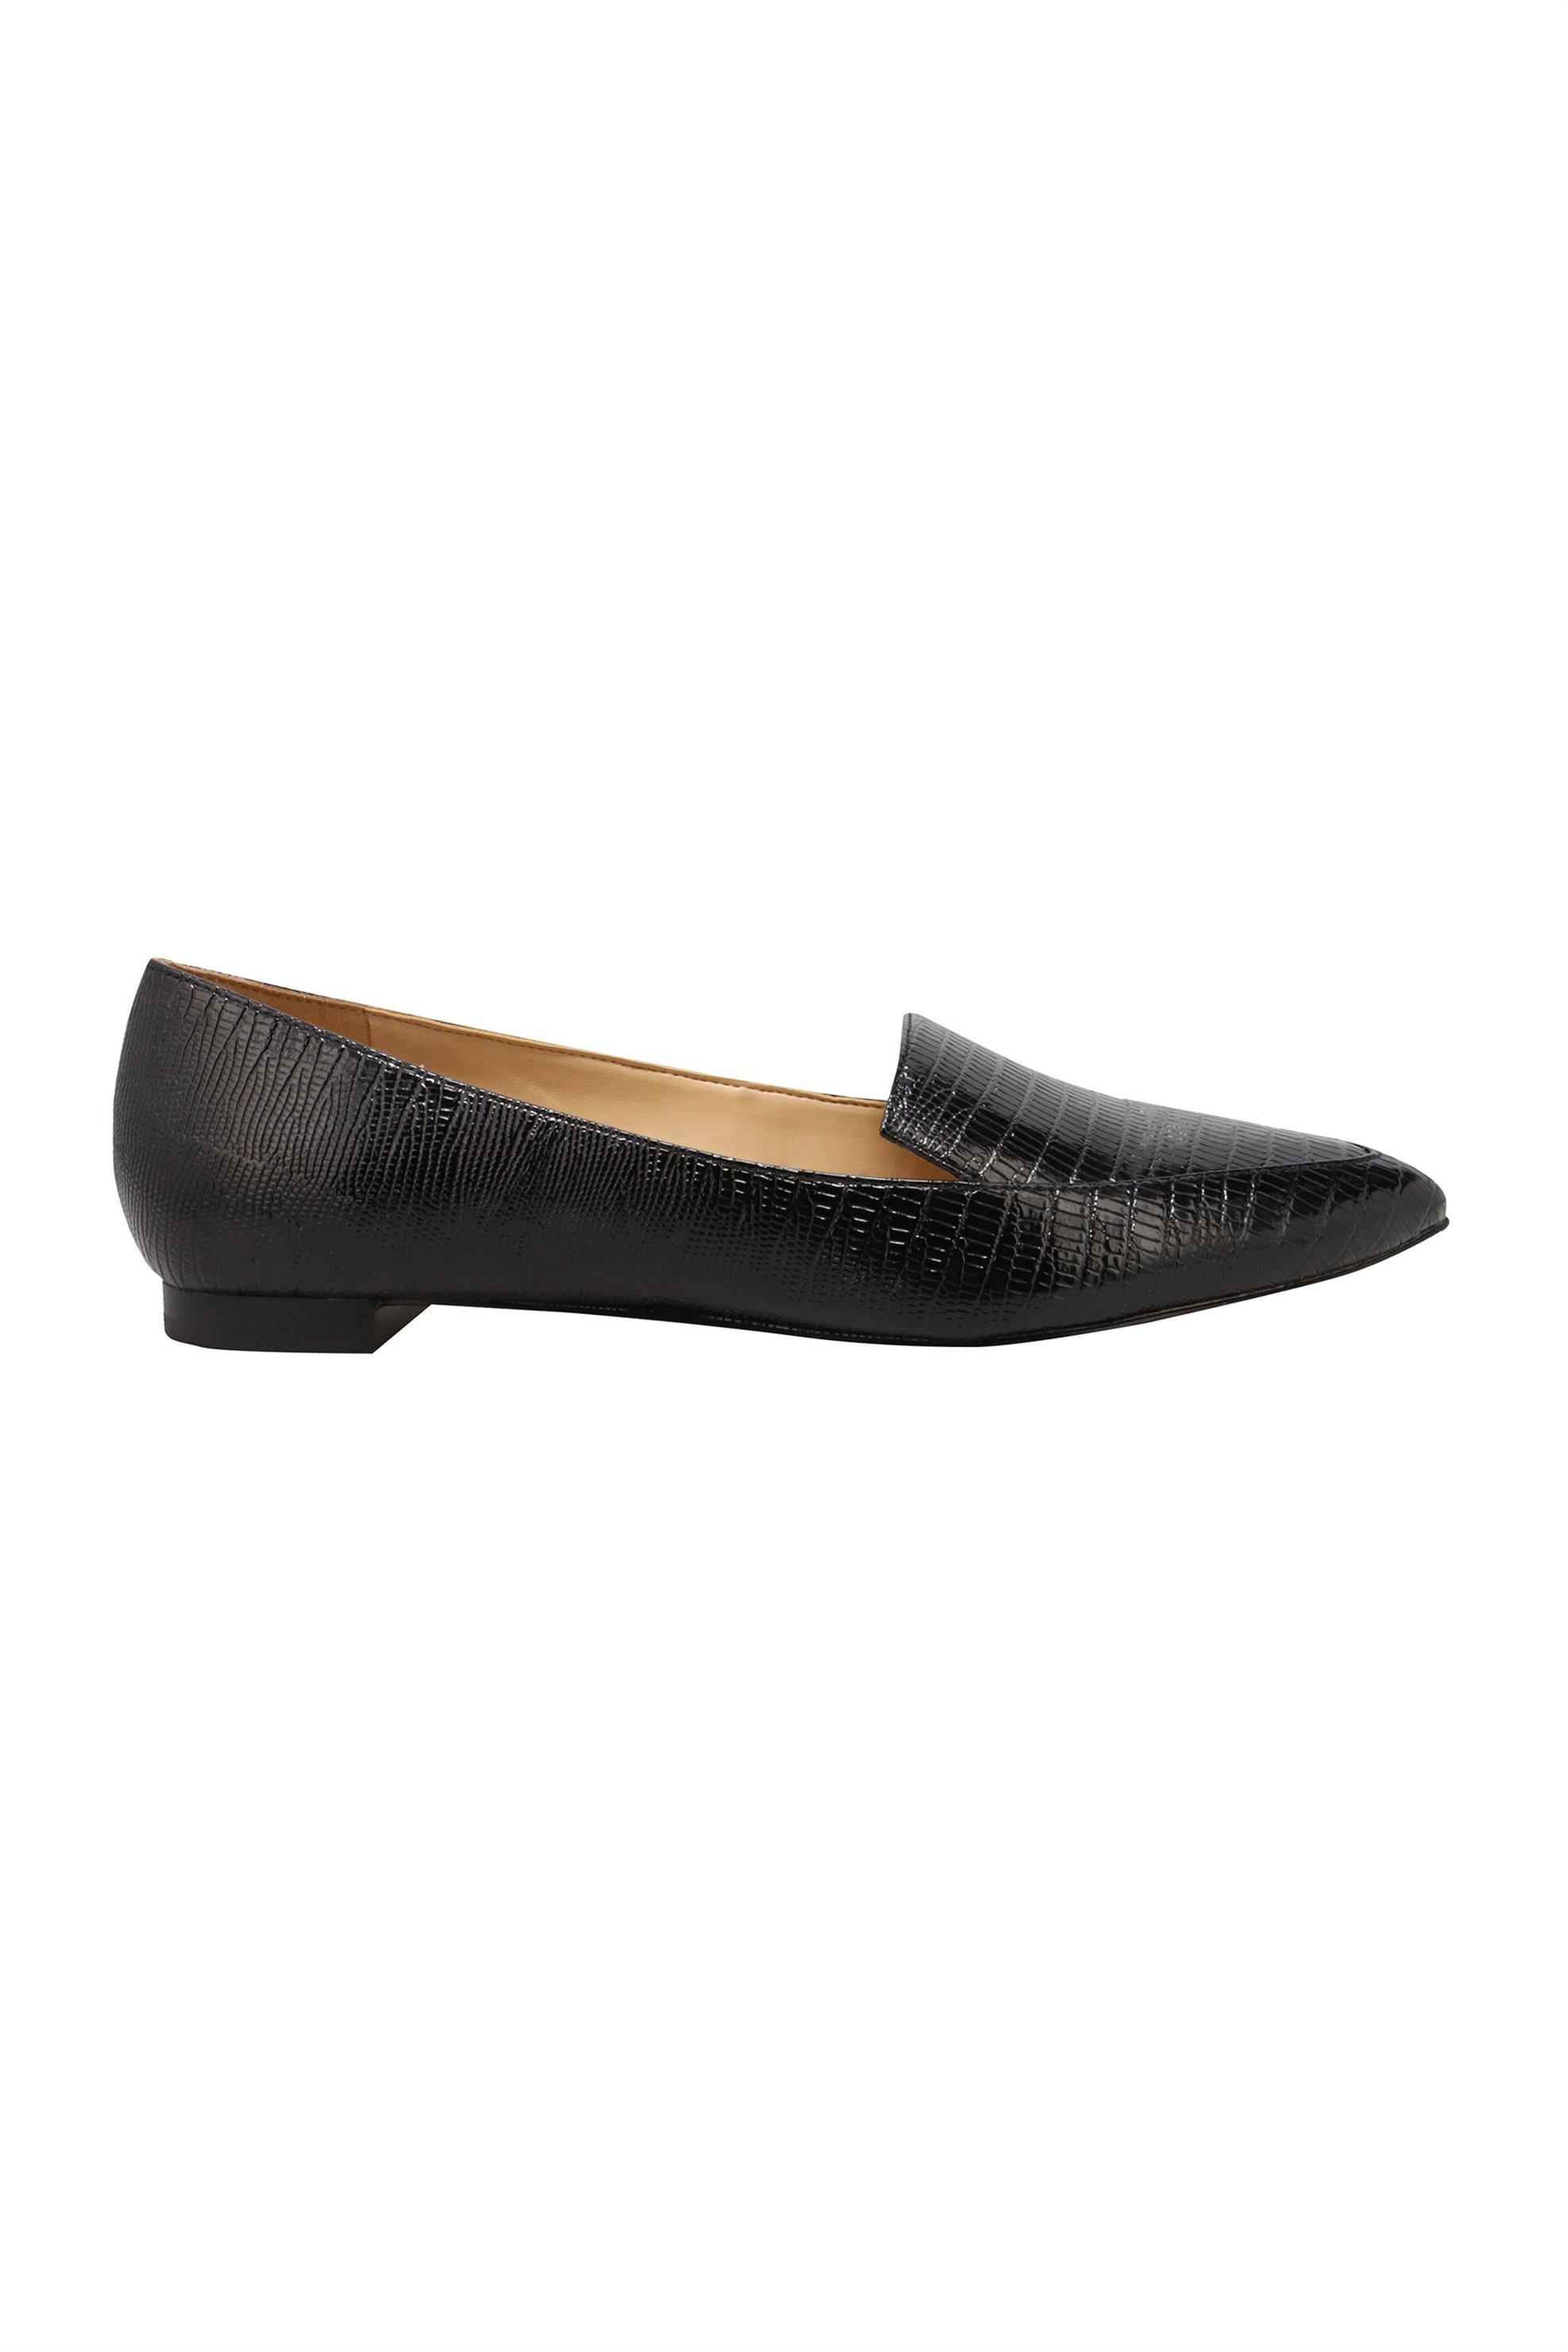 "Nine West γυναικεία flat παπούτσια με croco print ""Abay"" – ABAY3 TX – Μαύρο"